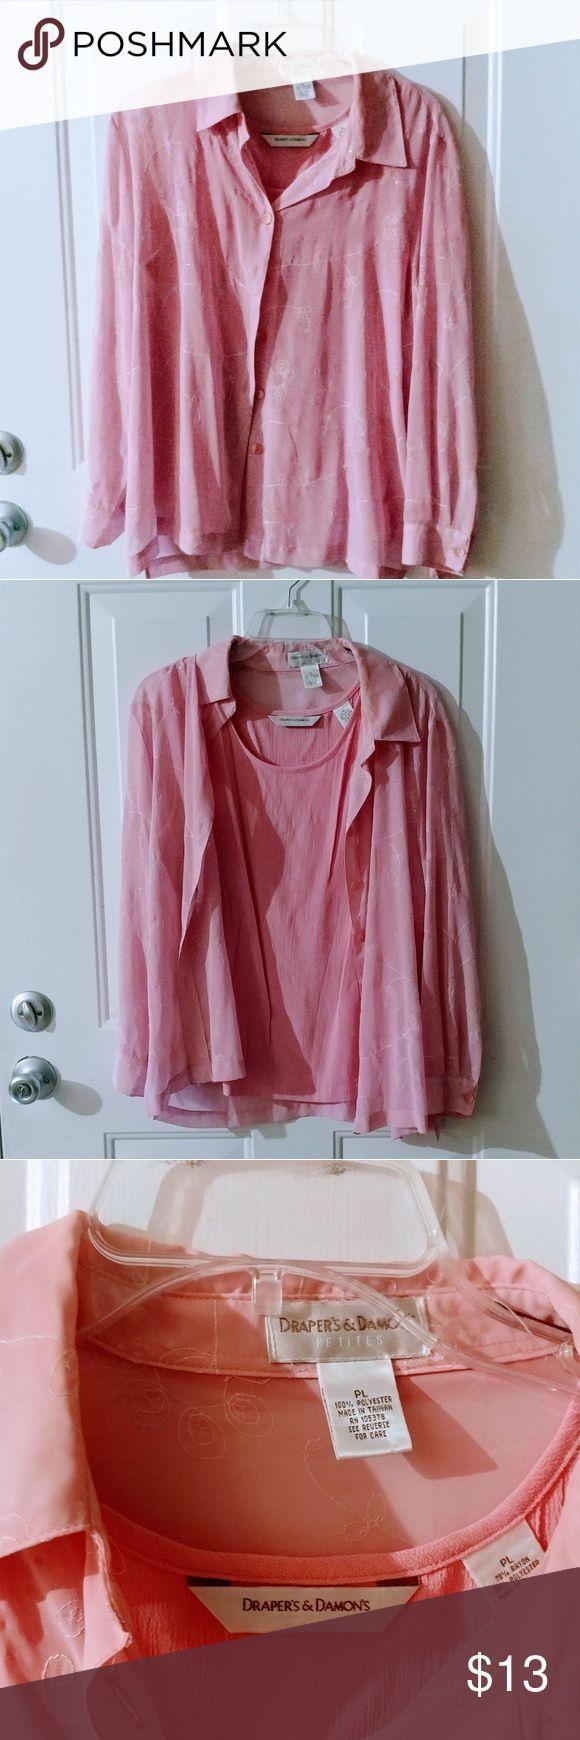 Draper's & Damon's Petite, 2 pieces Draper's & Damon's petite long sleeve shirt and sleeveless shirt. Draper's & Damon's Tops Blouses